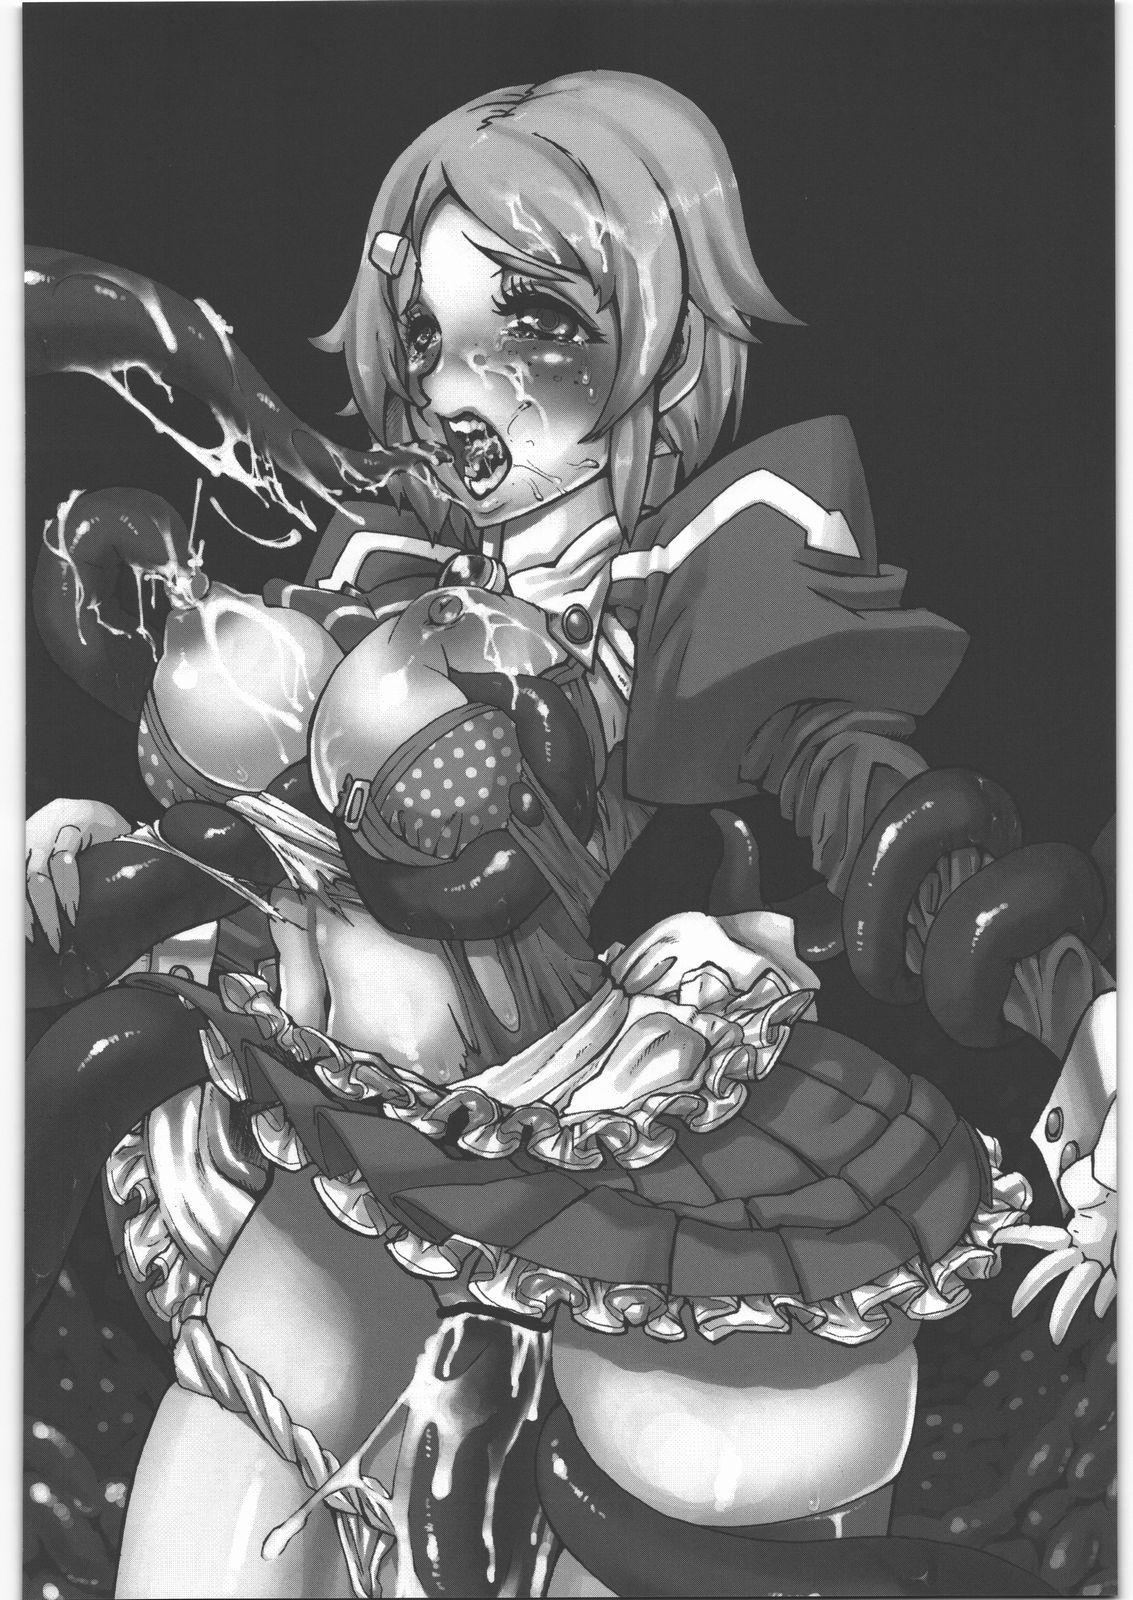 Asuna no Shokushu Party Ryoujoku Zeme Online 20